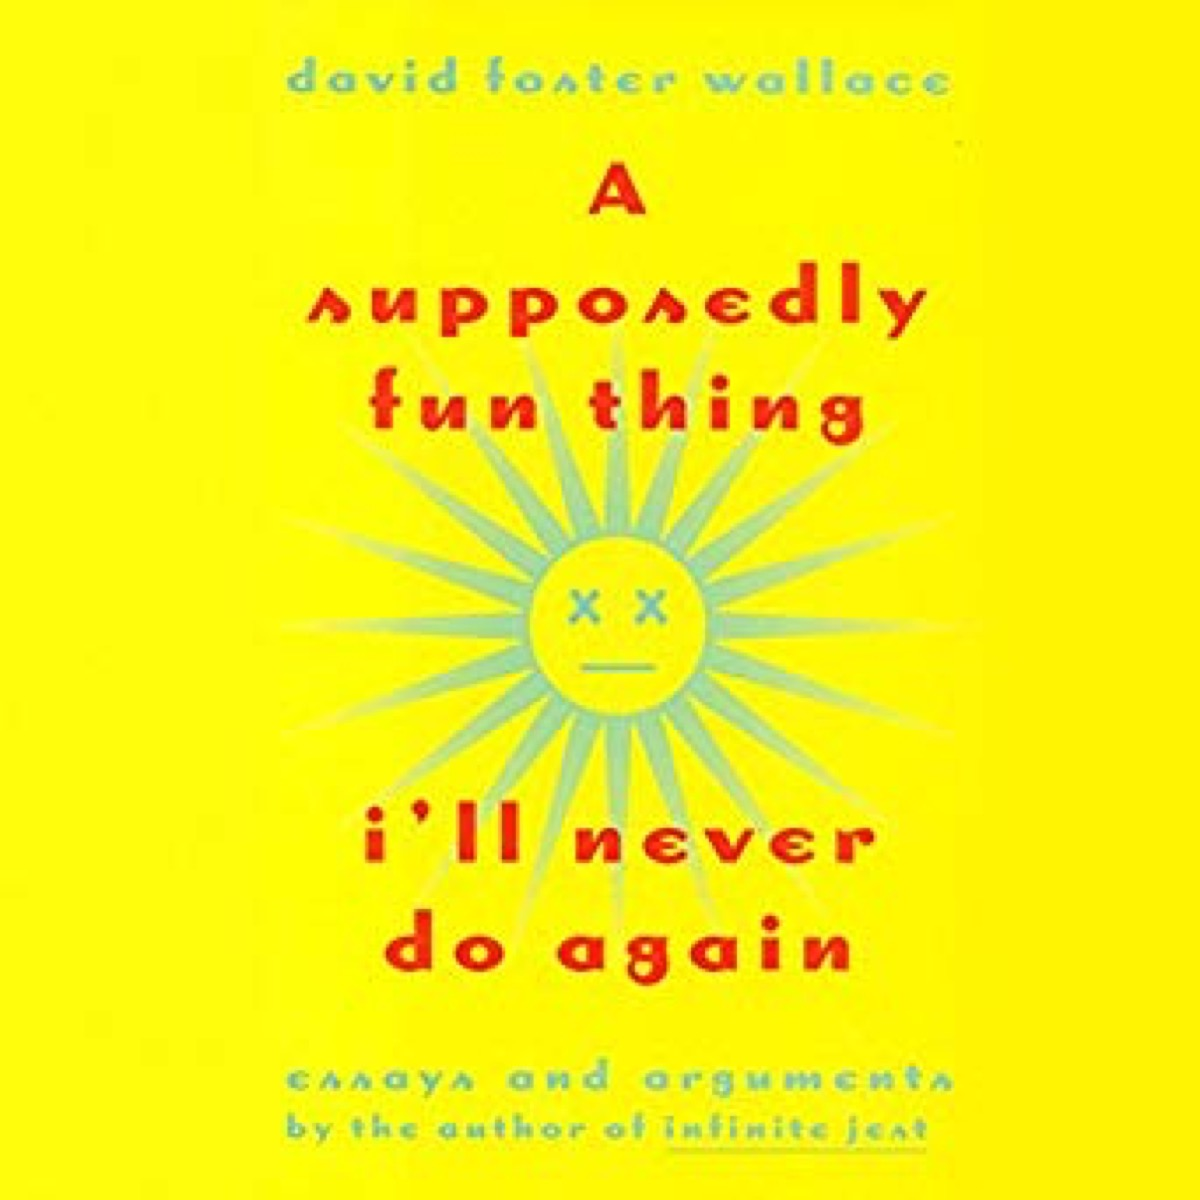 fun thing i'll never do again 40 funny books